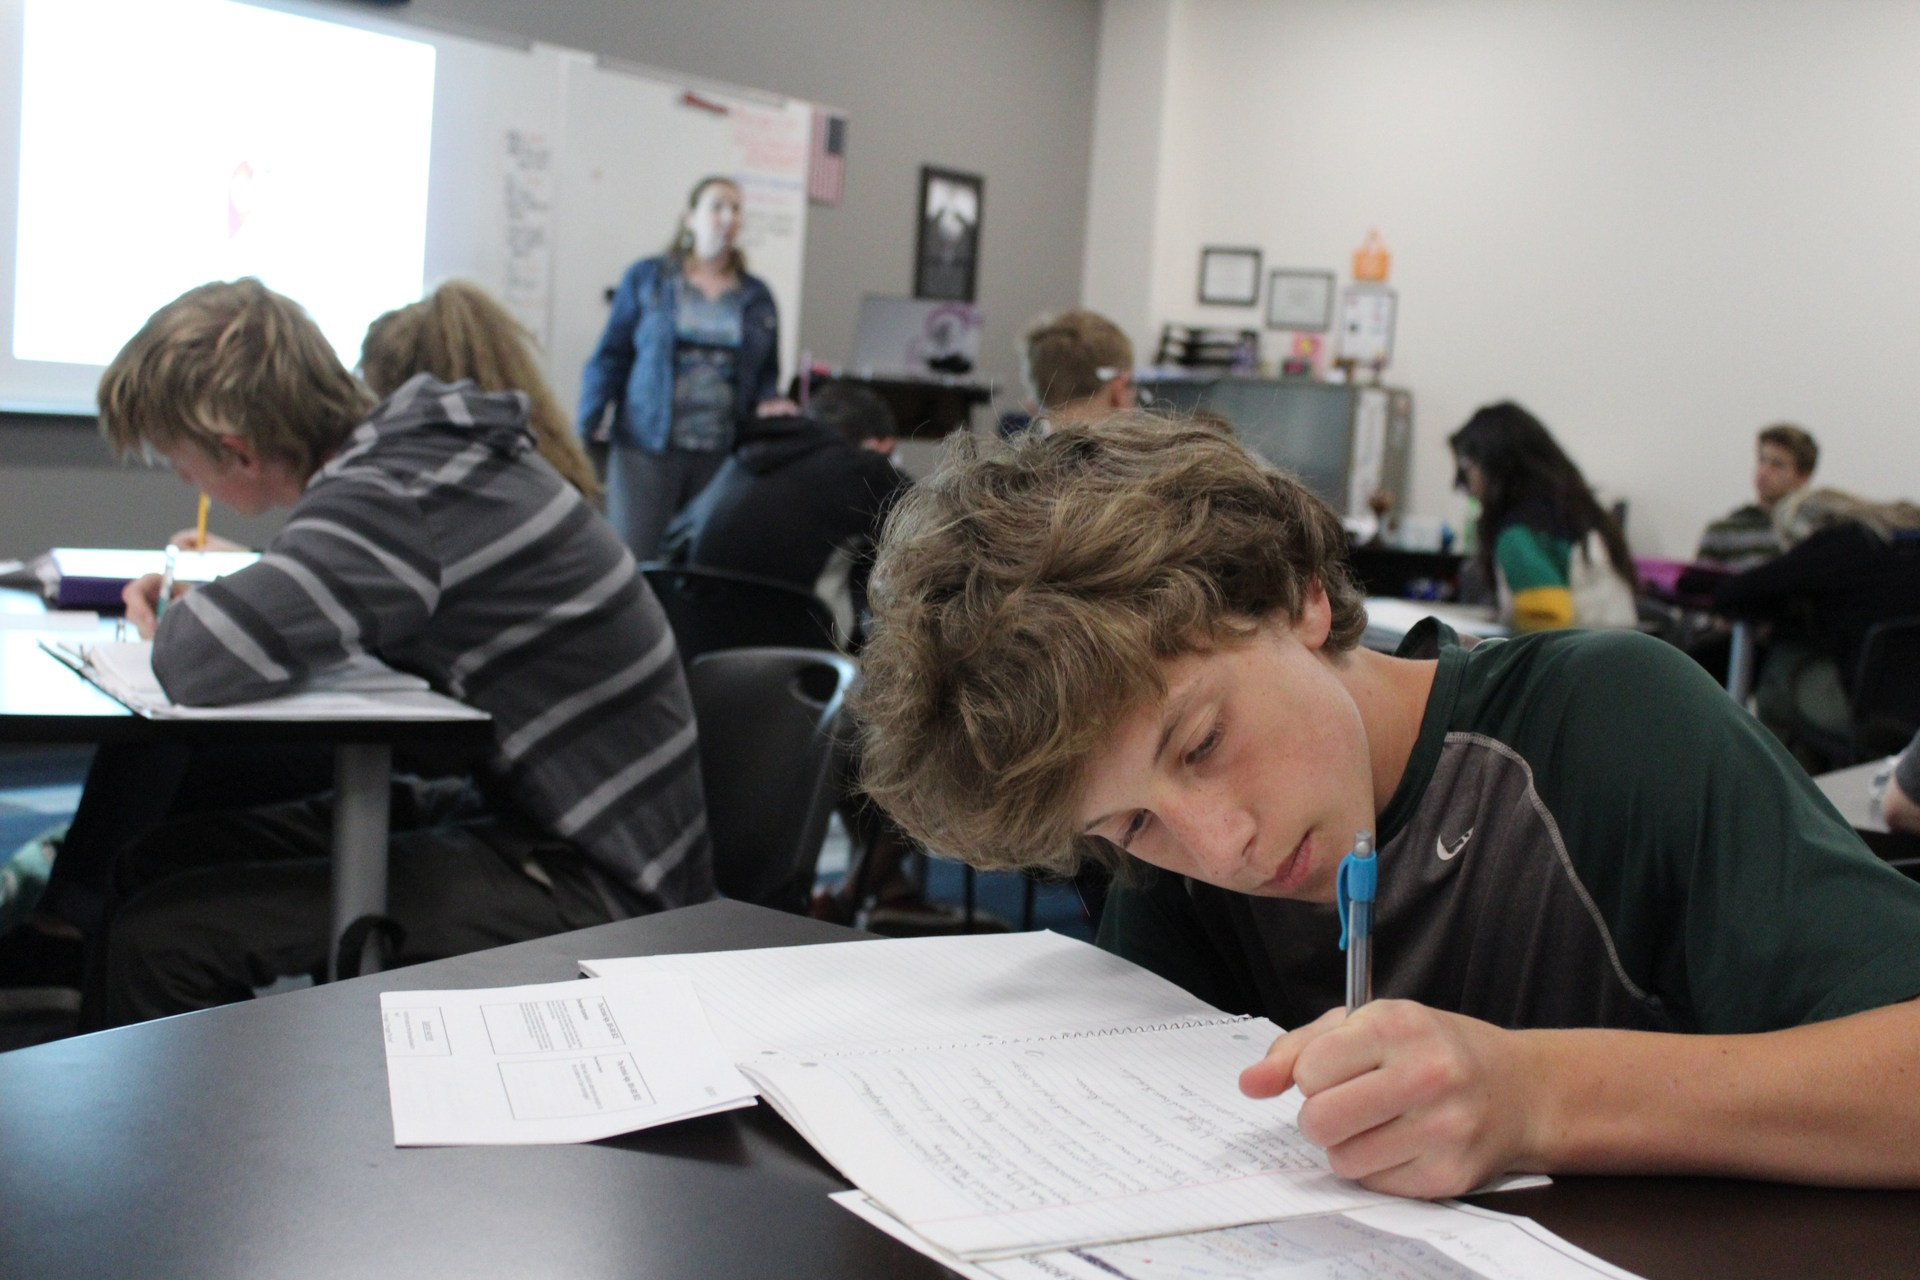 Students working hard